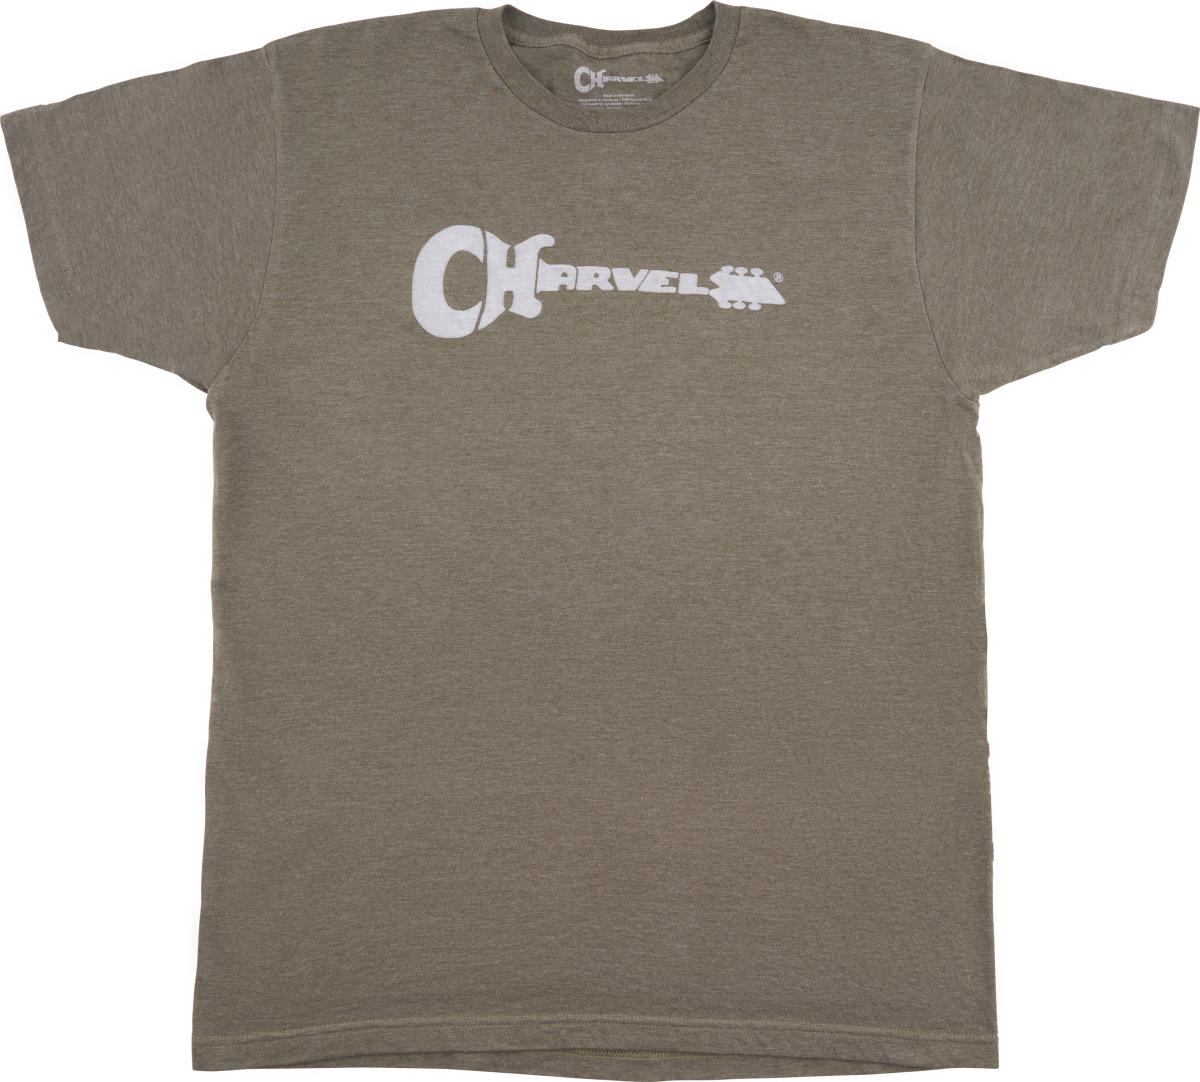 Charvel Charvel® Guitar Logo T-Shirt, Heather Green, L